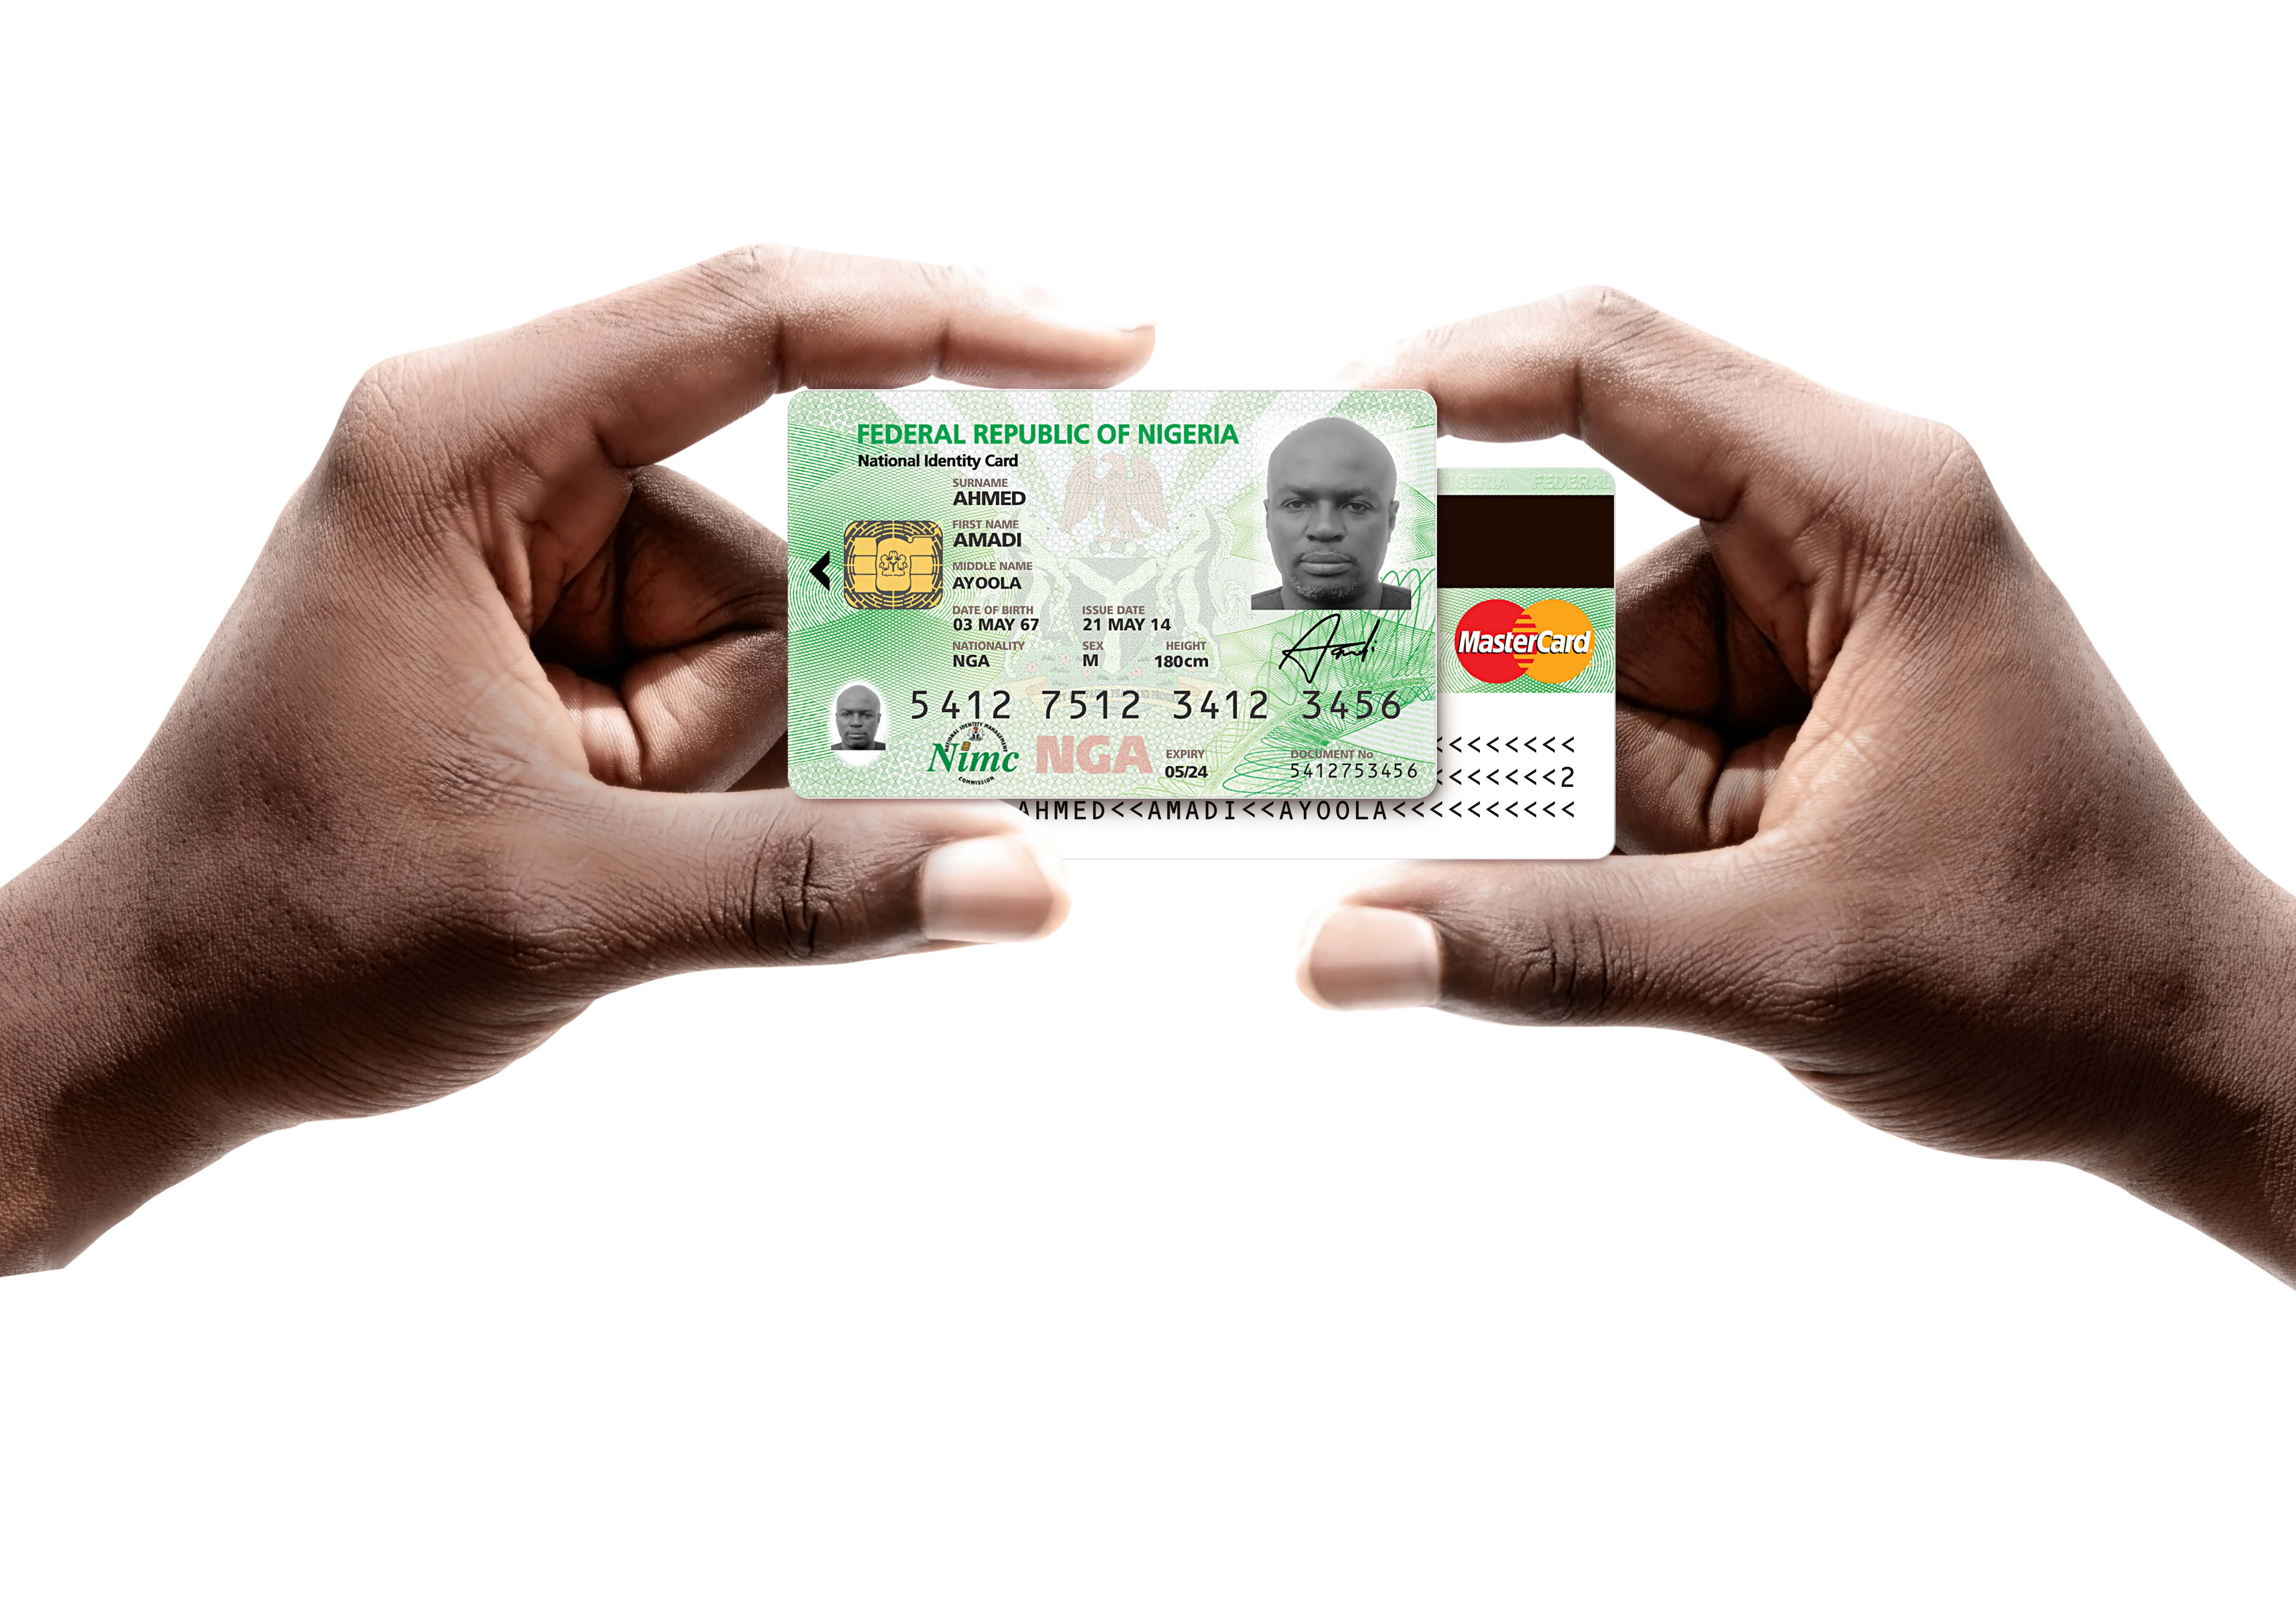 Zoosk Spendon Visa